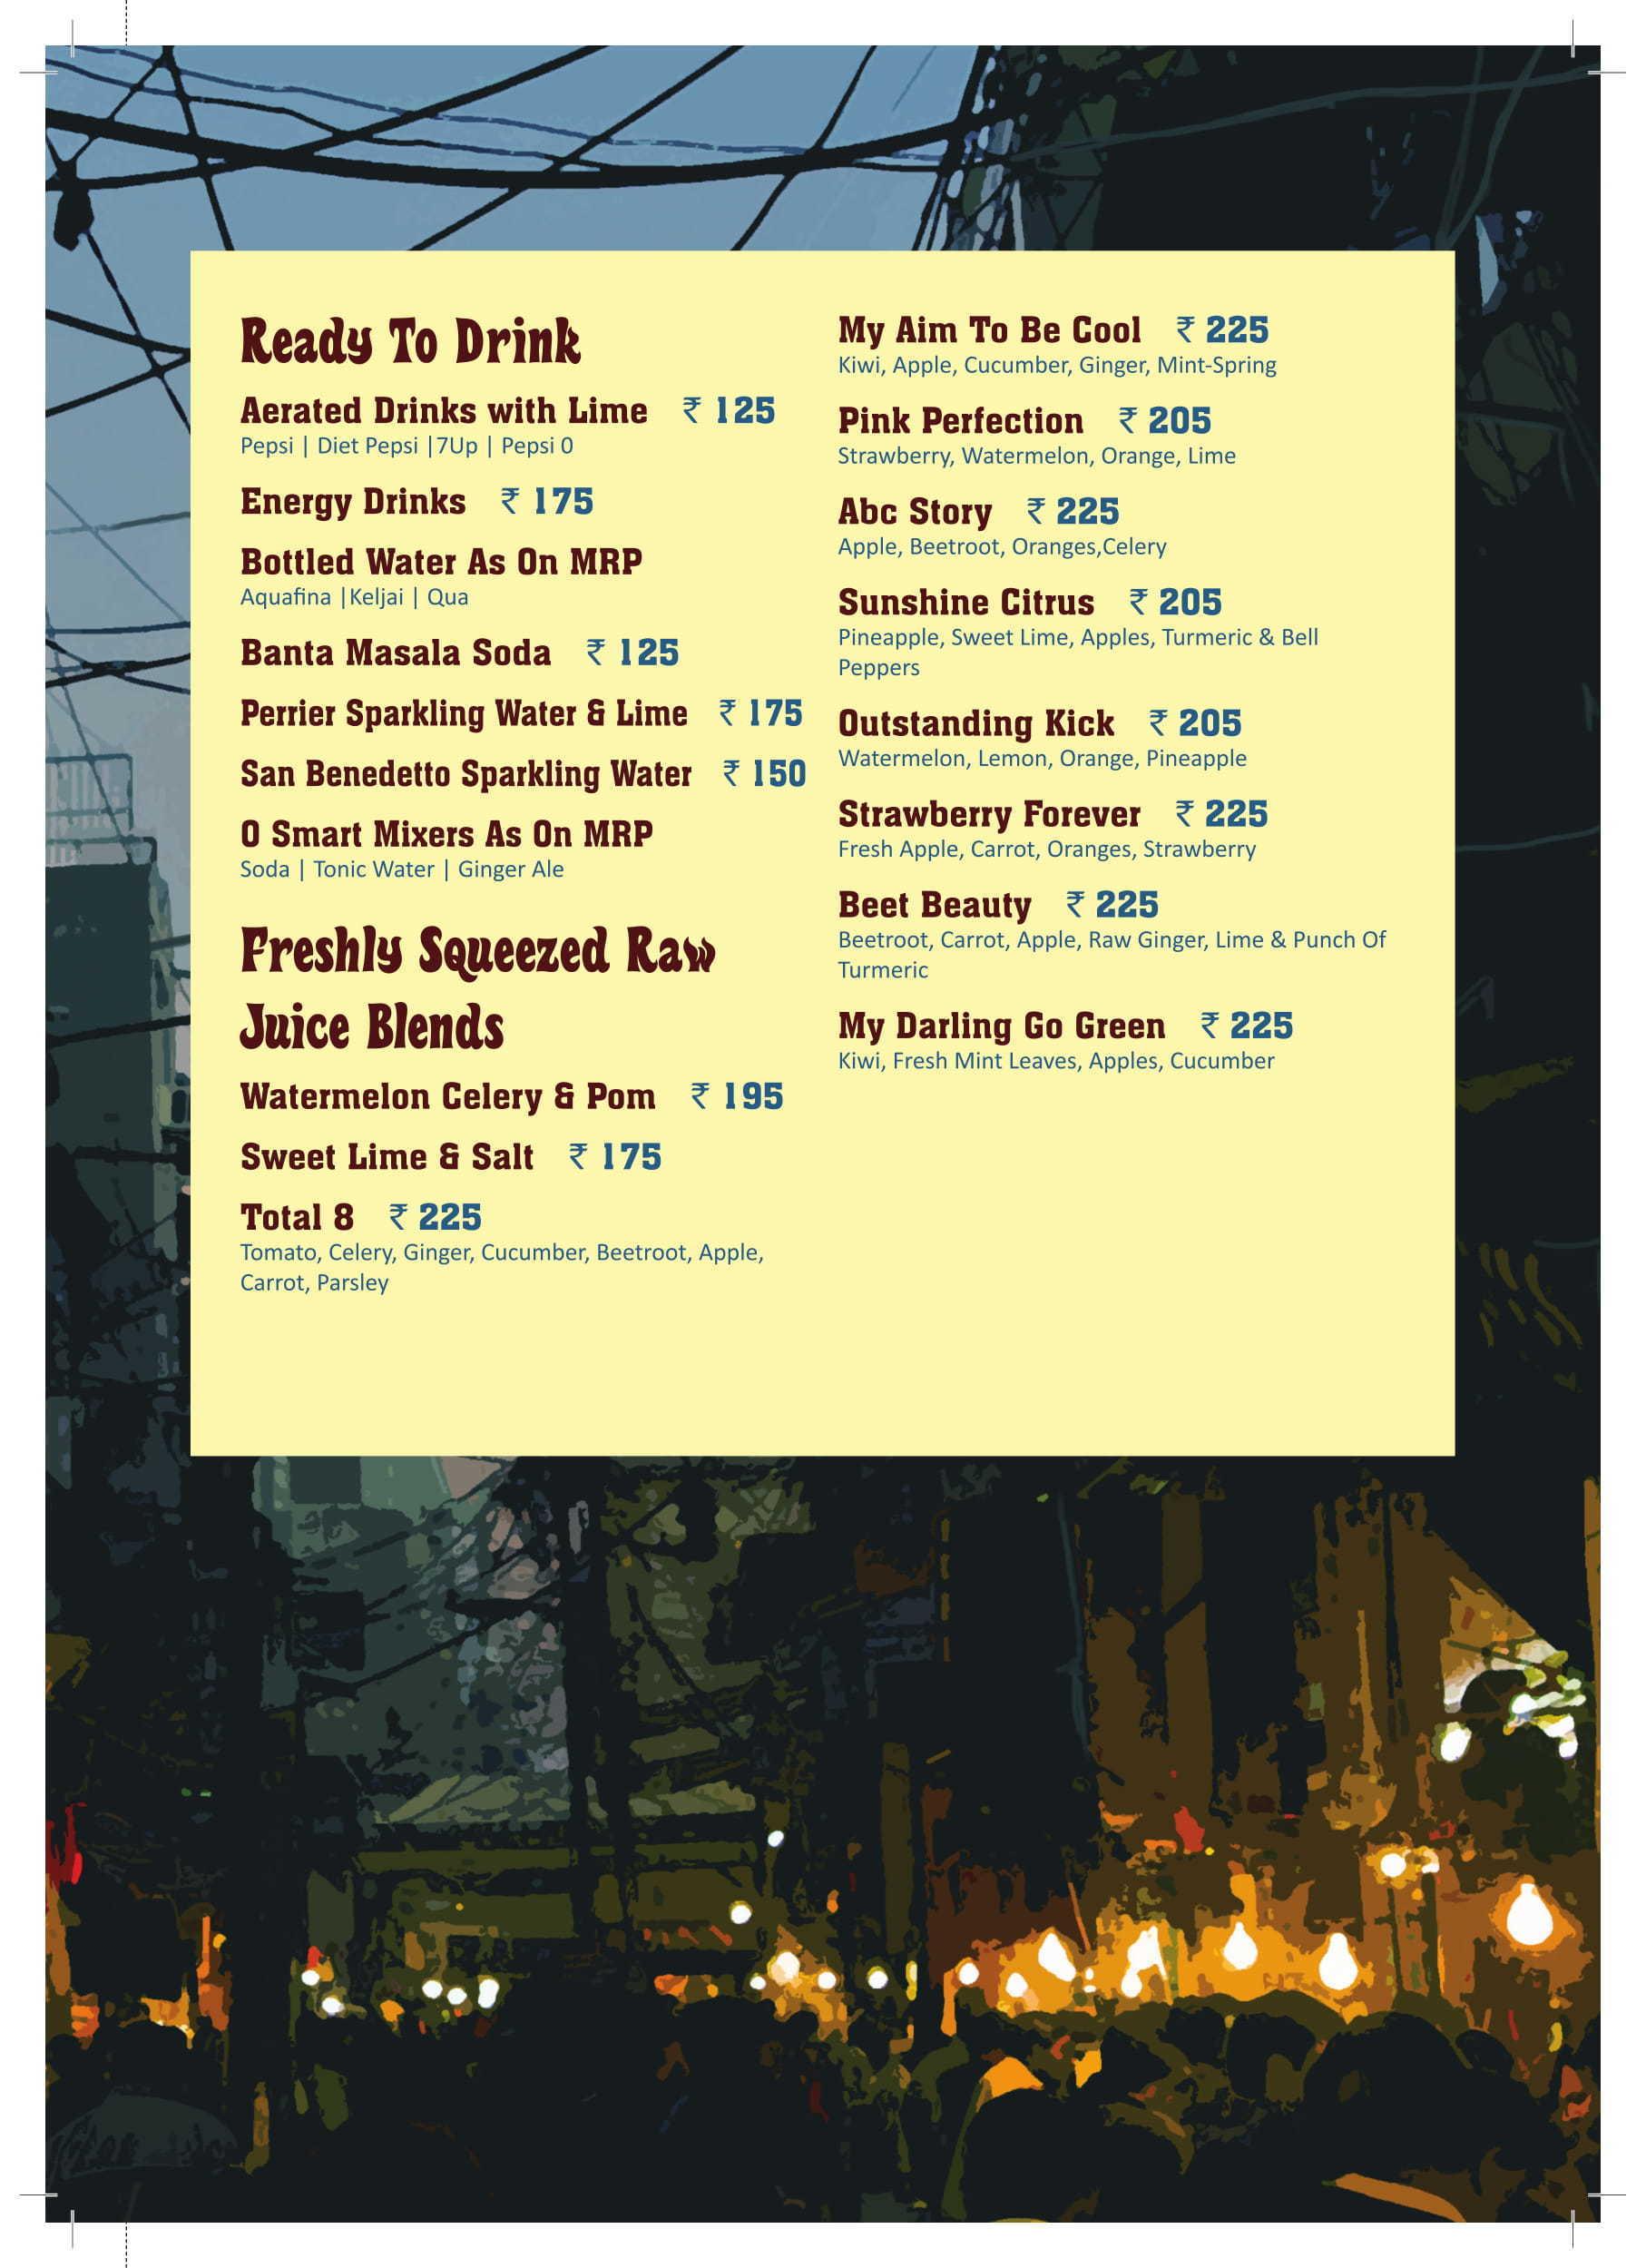 CAFE DELHI HEIGHTS - DLF PROMENADE MALL - VASANT KUNJ - NEW